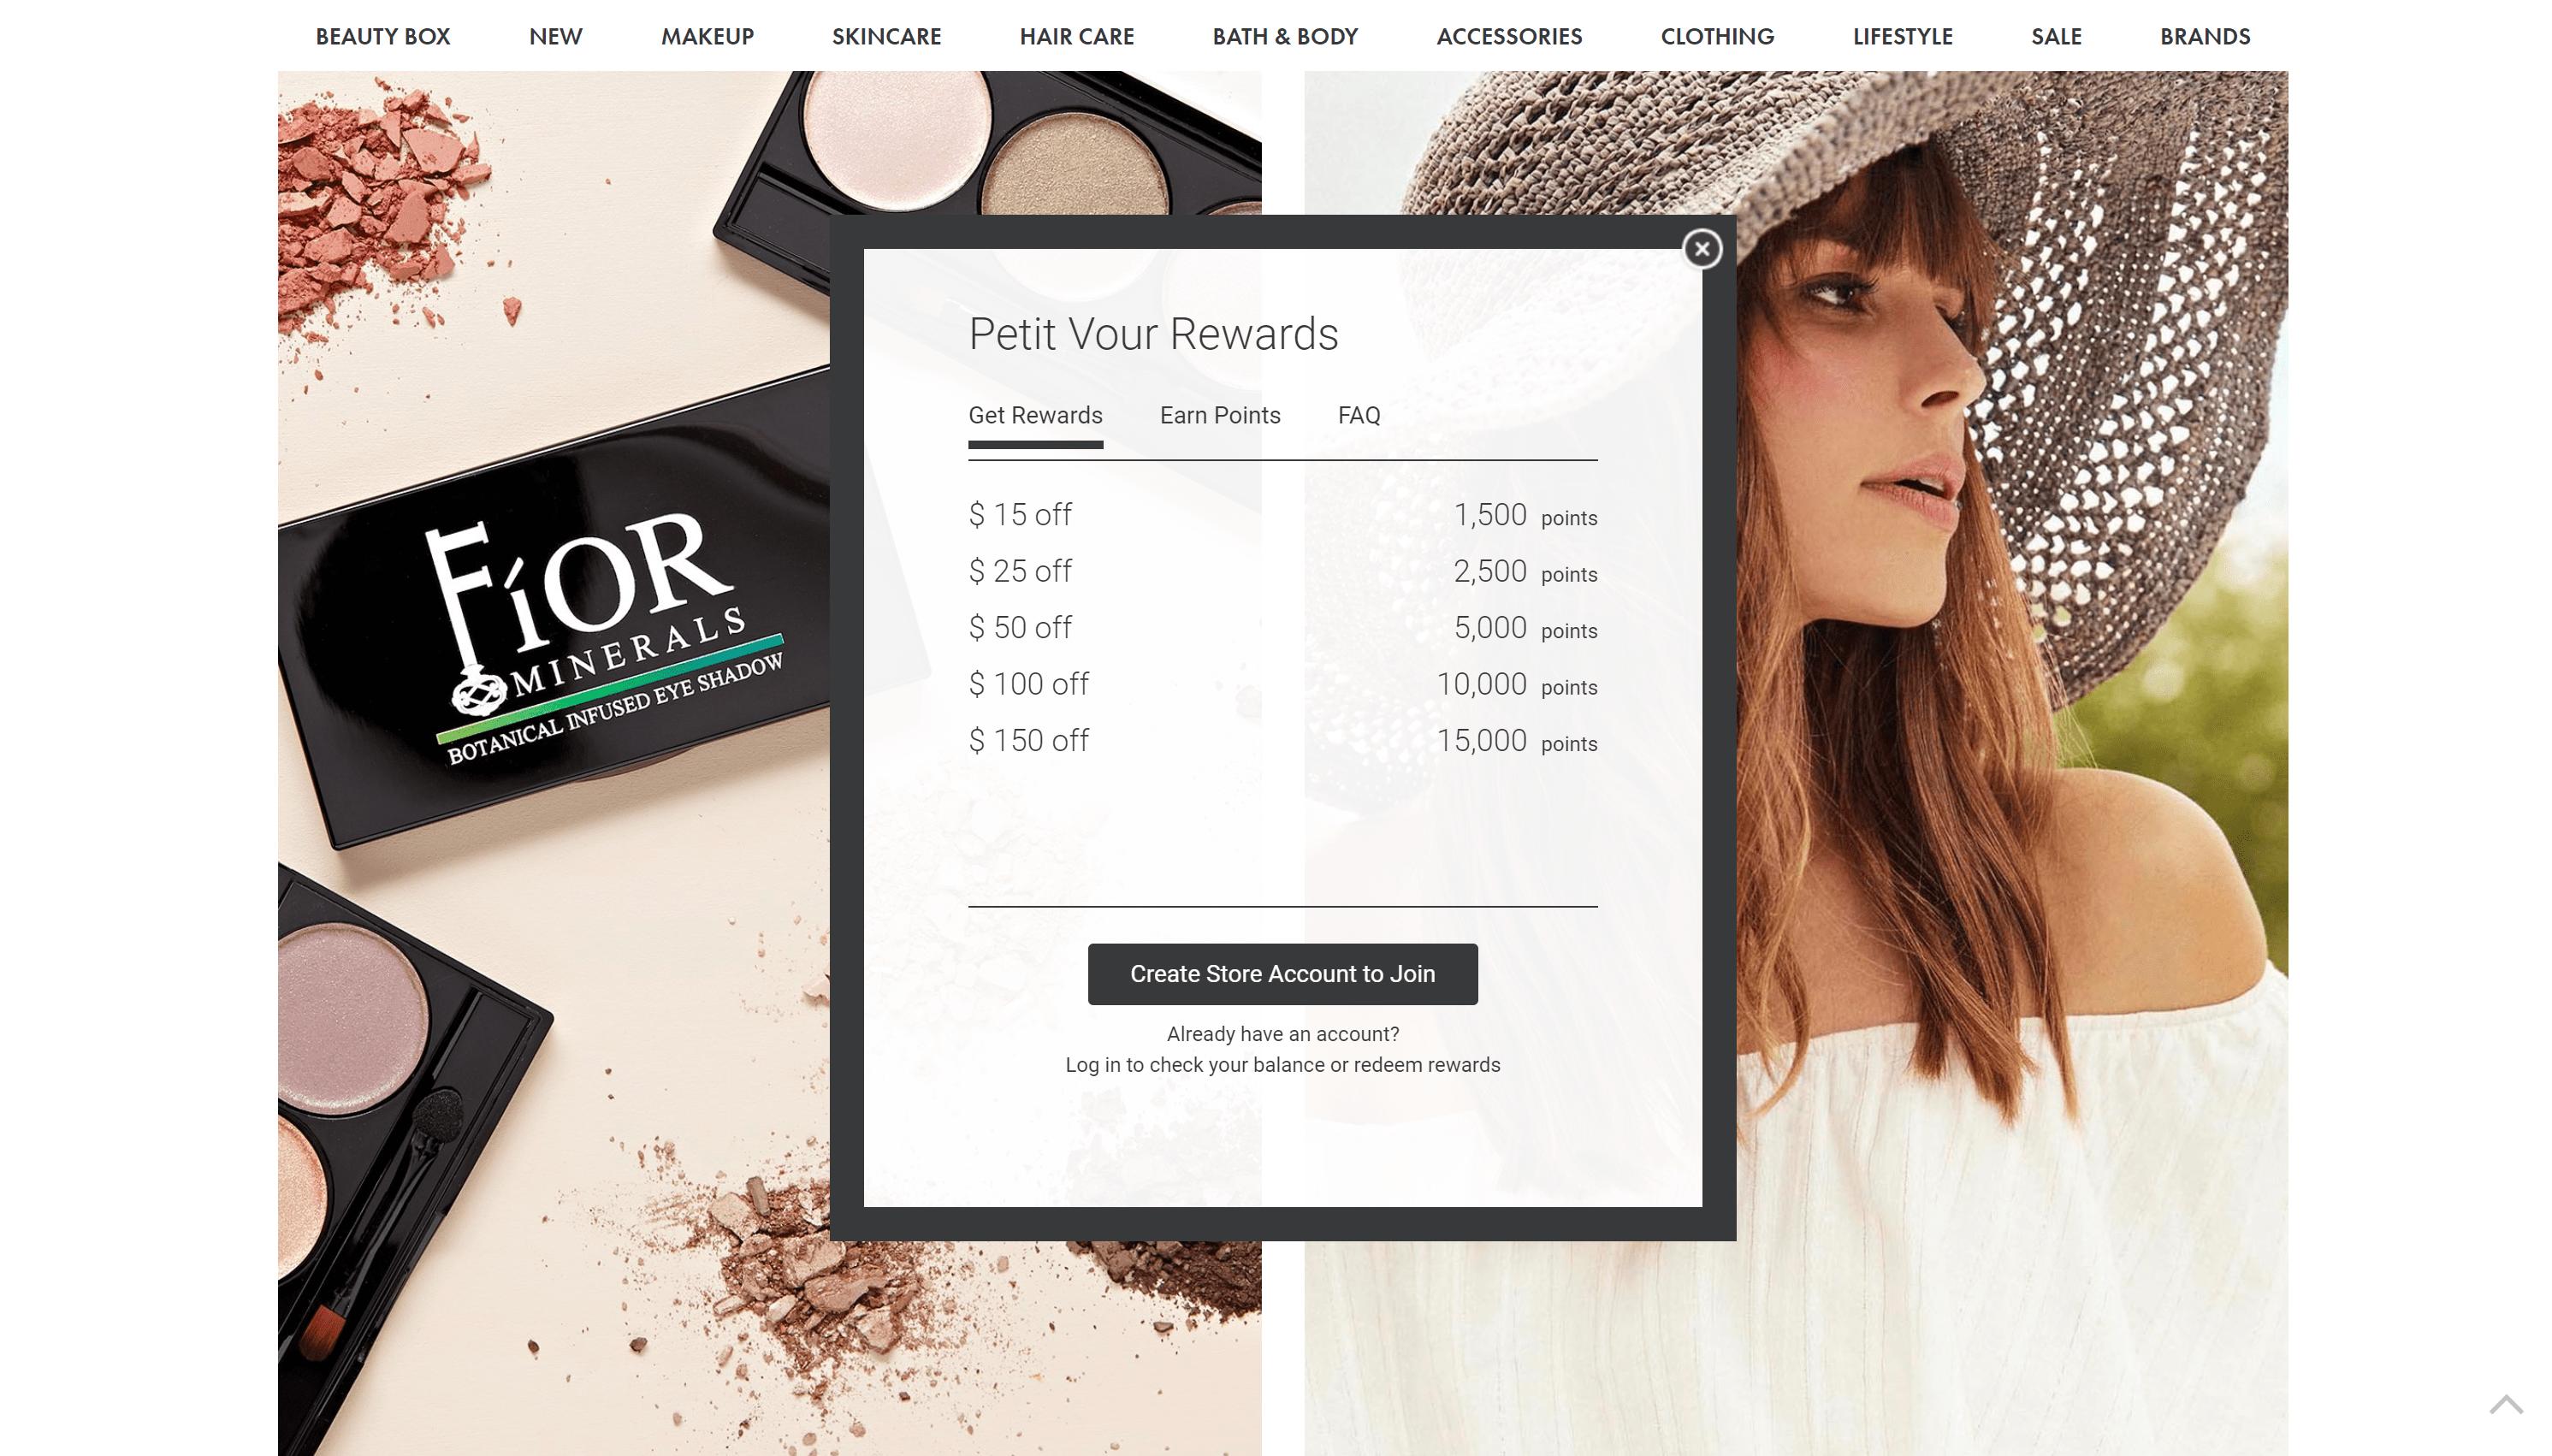 Petit Vour review offers